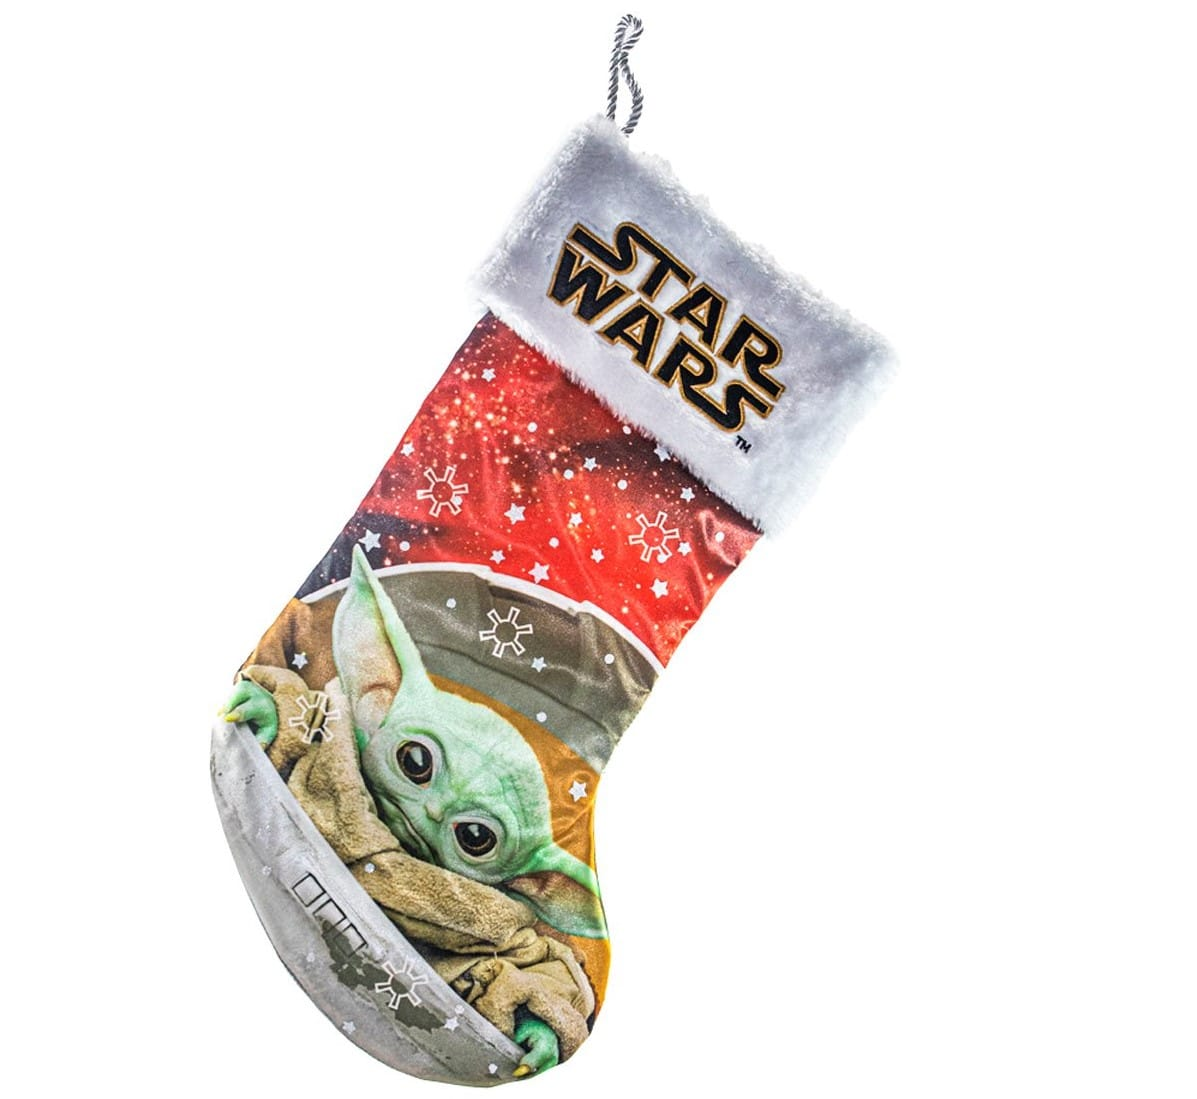 Baby Yoda Christmas stockings, nutcracker and snow globe make us feel like it's Christmas in June 15